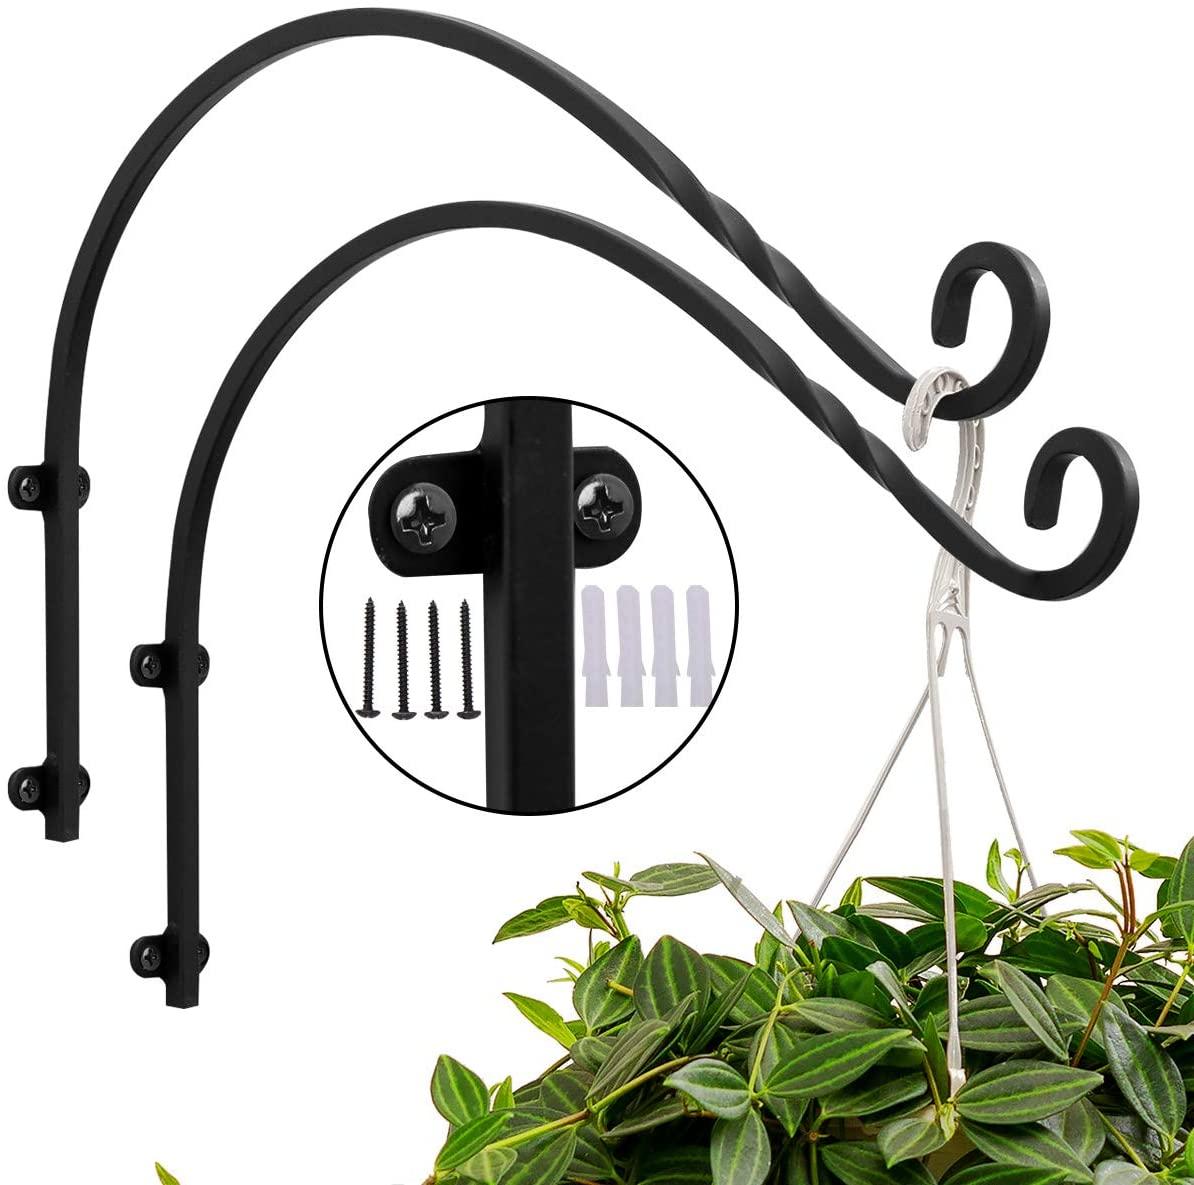 ORZ 16 Inch Outdoor Planter Hook Pack of 2, Plant Hanger Bracket for Garden Deck Railing Flower Pots and Tree Bird Feeder